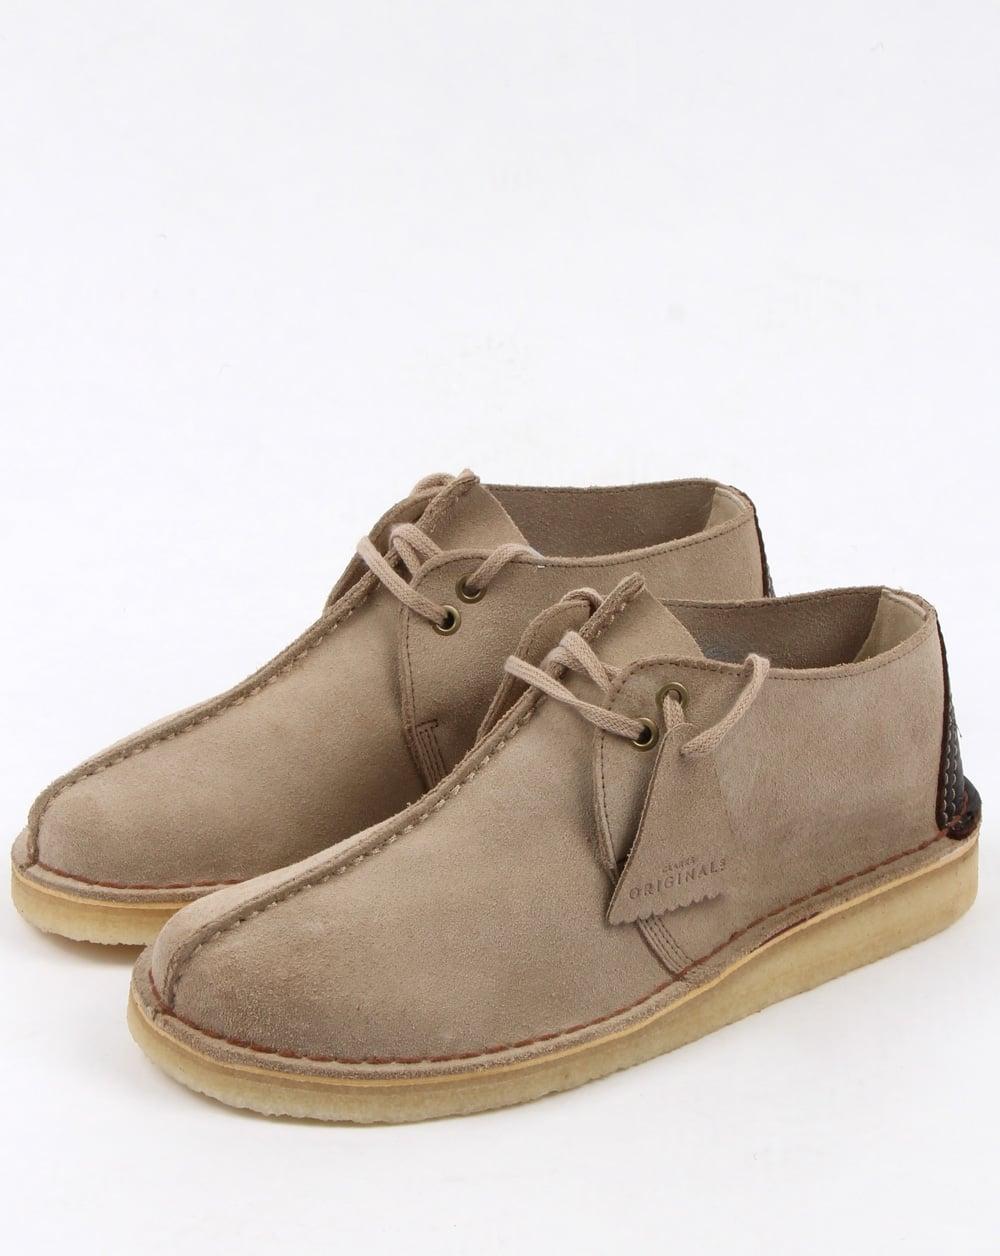 bdb27a8db427 Clarks Originals Clarks Originals Desert Trek Suede Shoes Sand